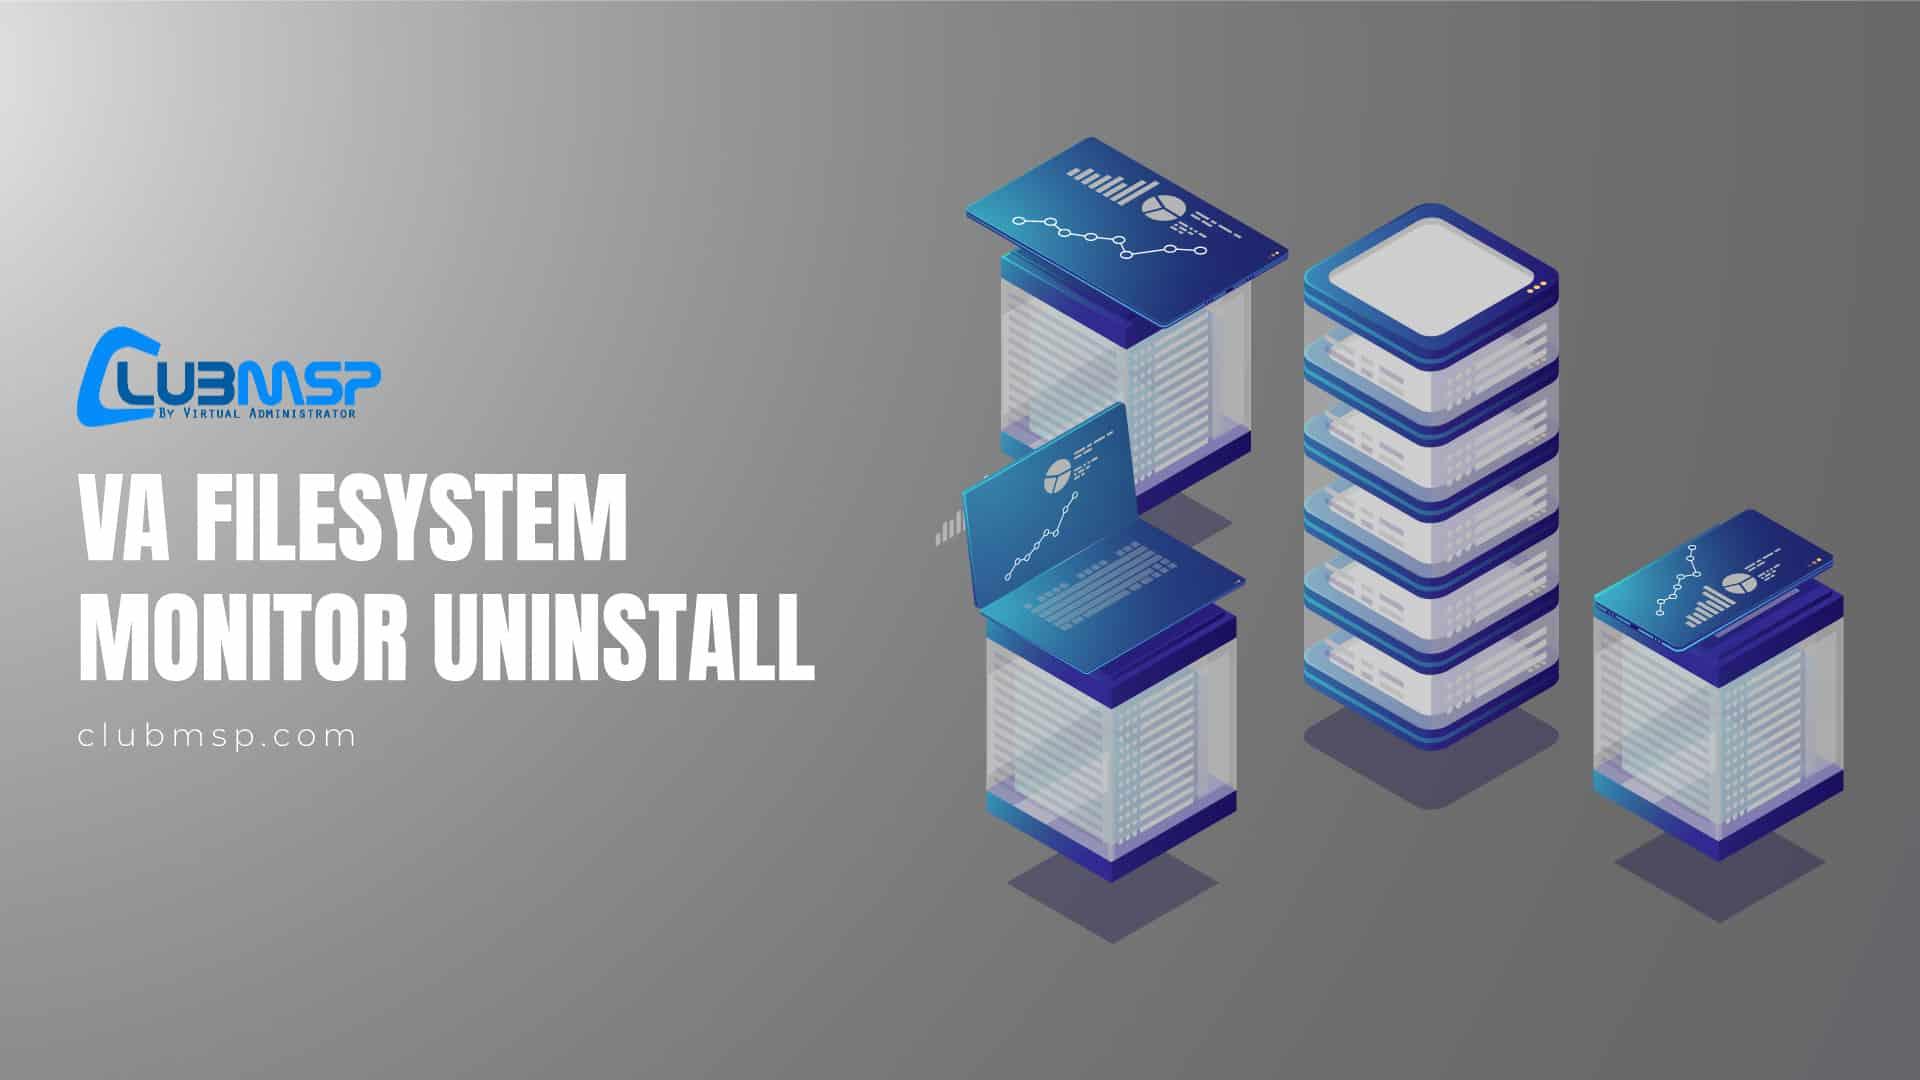 VA-Filesystem-Monitor-Uninstall